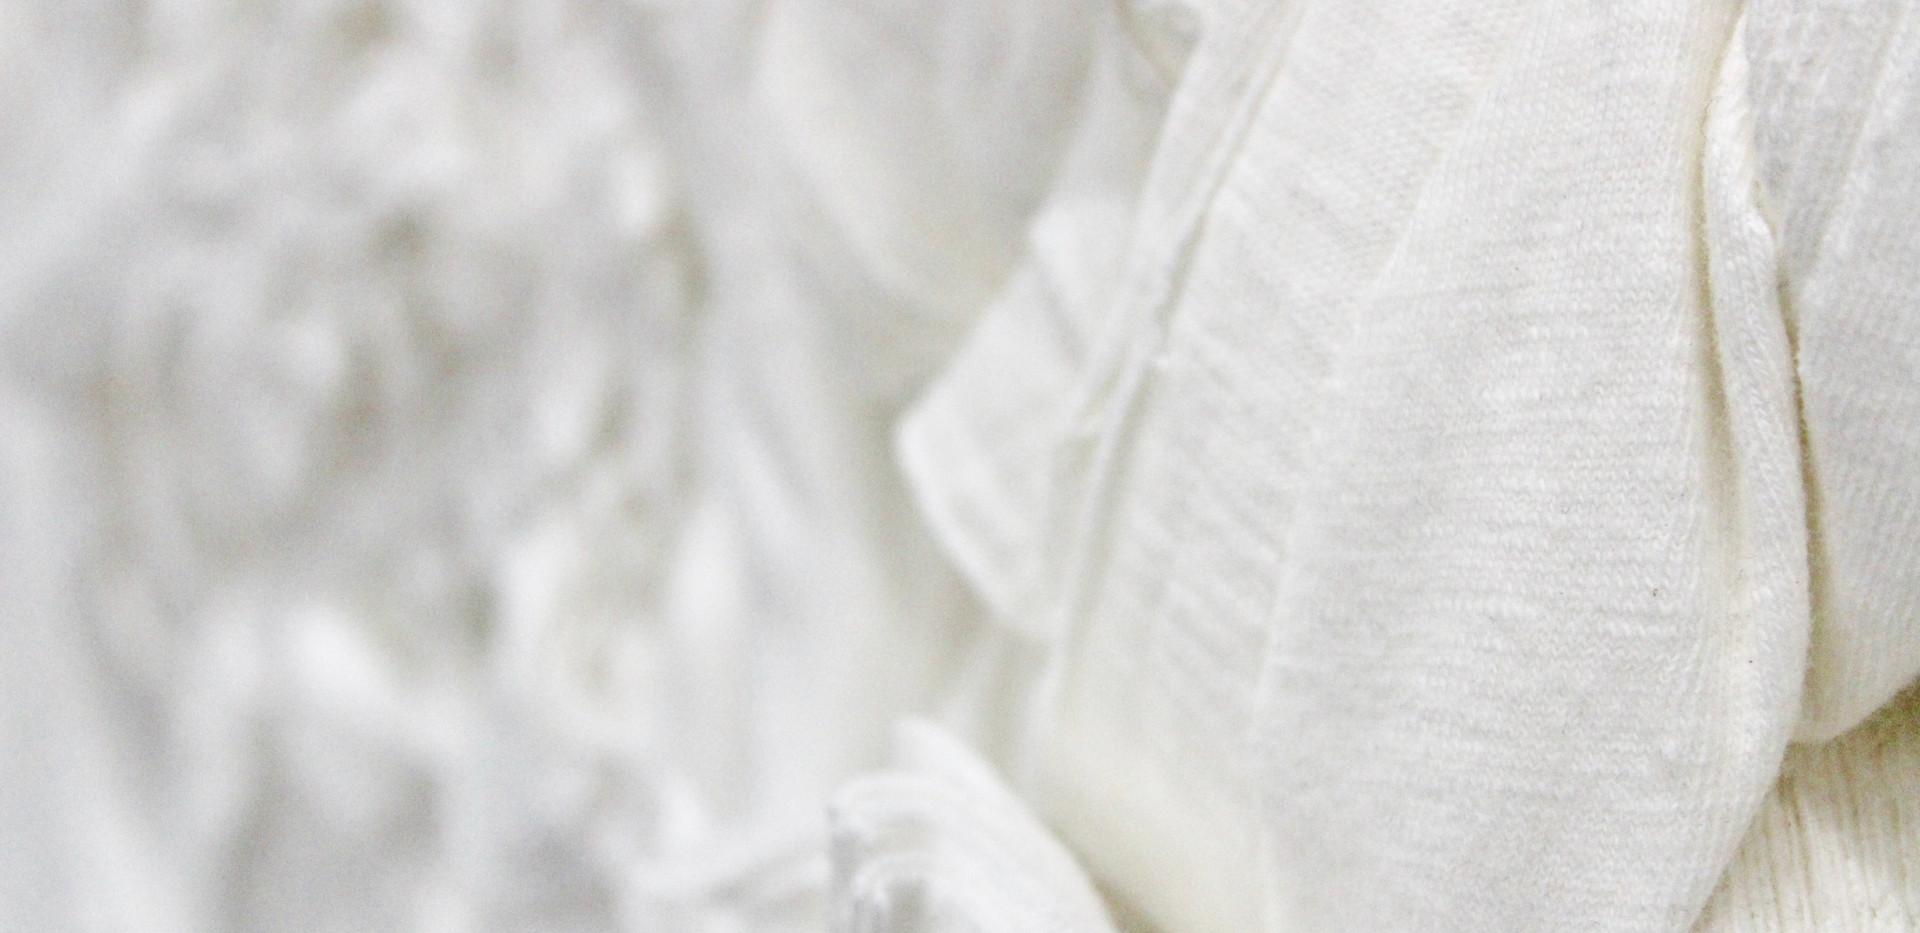 Off white 100% cotton clips